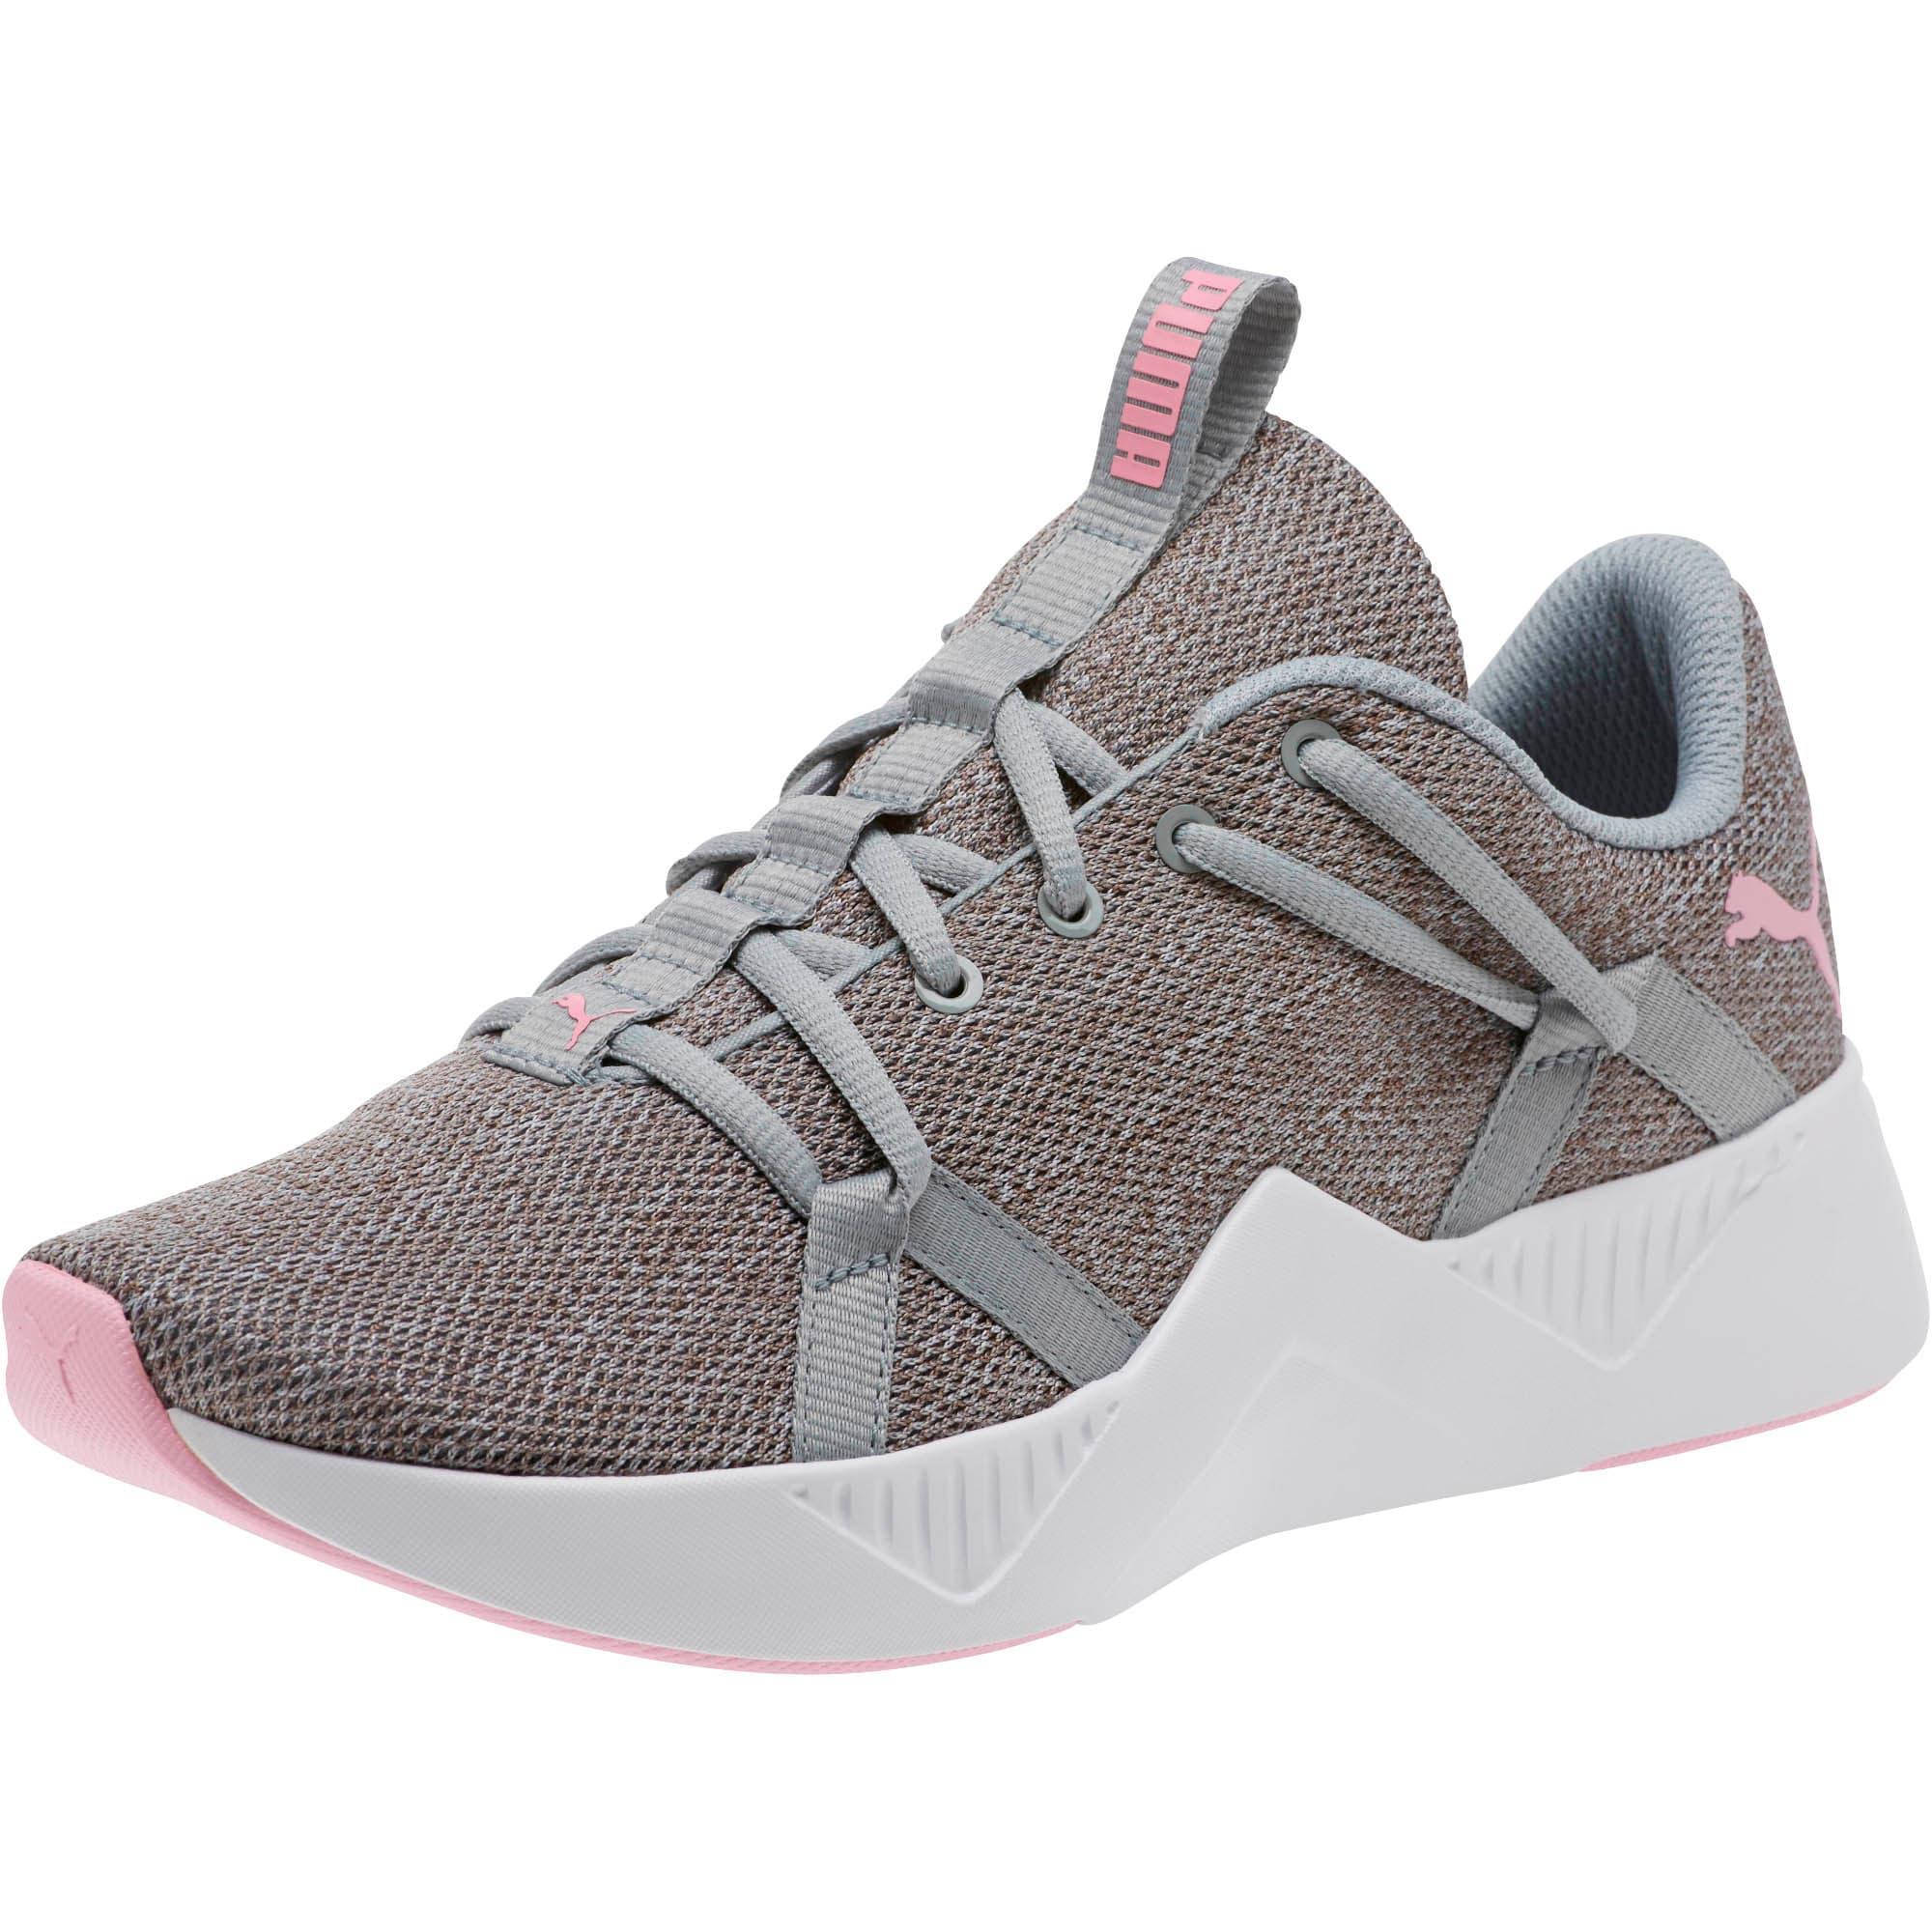 Thumbnail 1 of Incite Knit Women's Training Shoes, Quarry-Pale Pink, medium